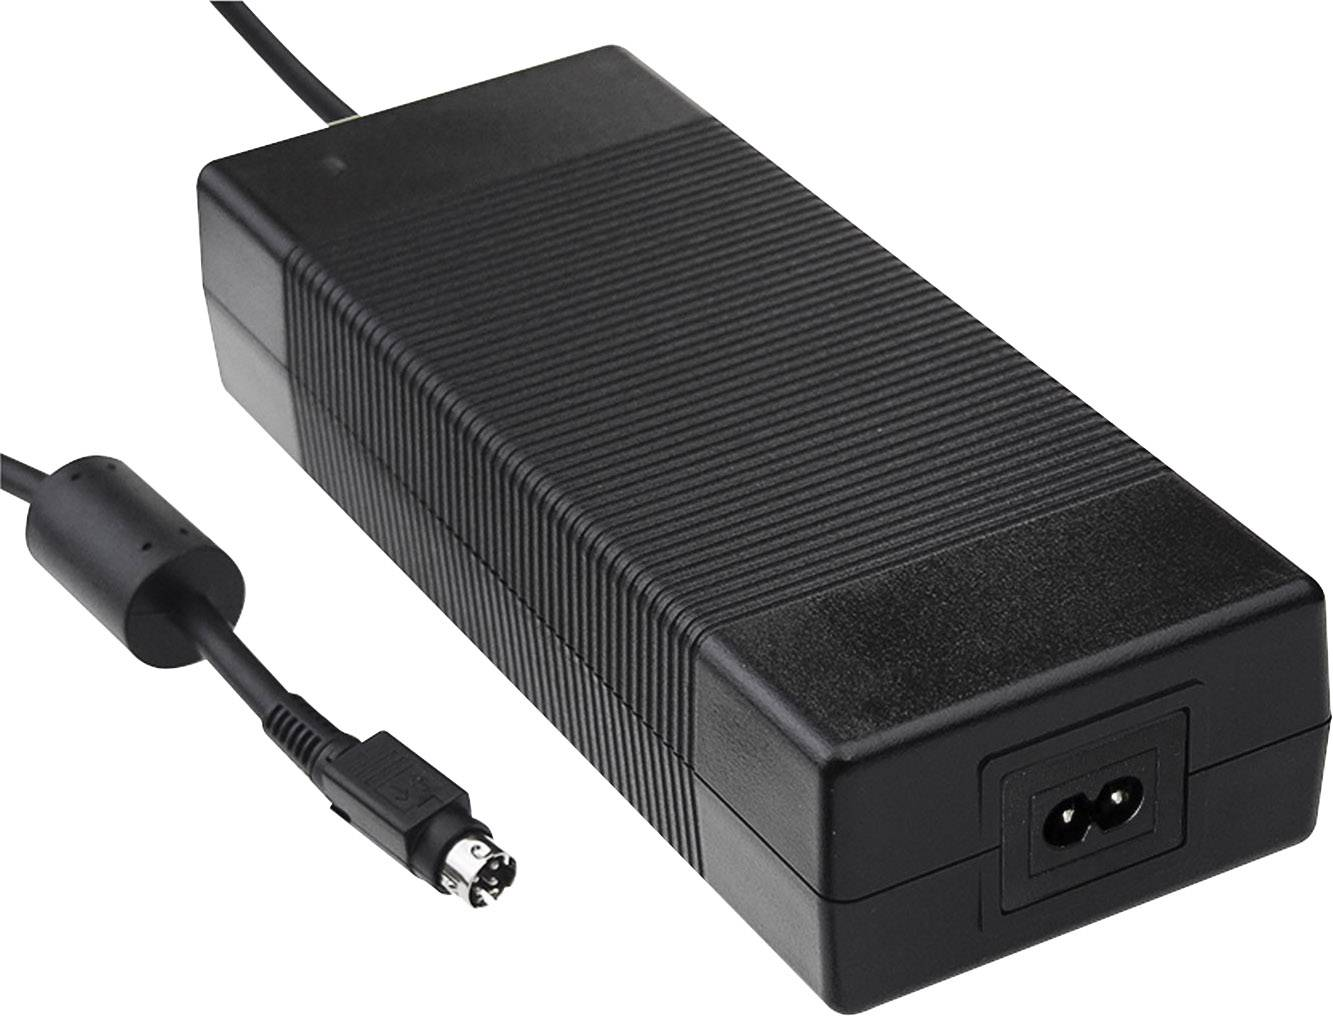 Stolní napájecí adaptér, stálé napětí Mean Well GSM220B12-R7B 12 V/DC 15 A 180 W